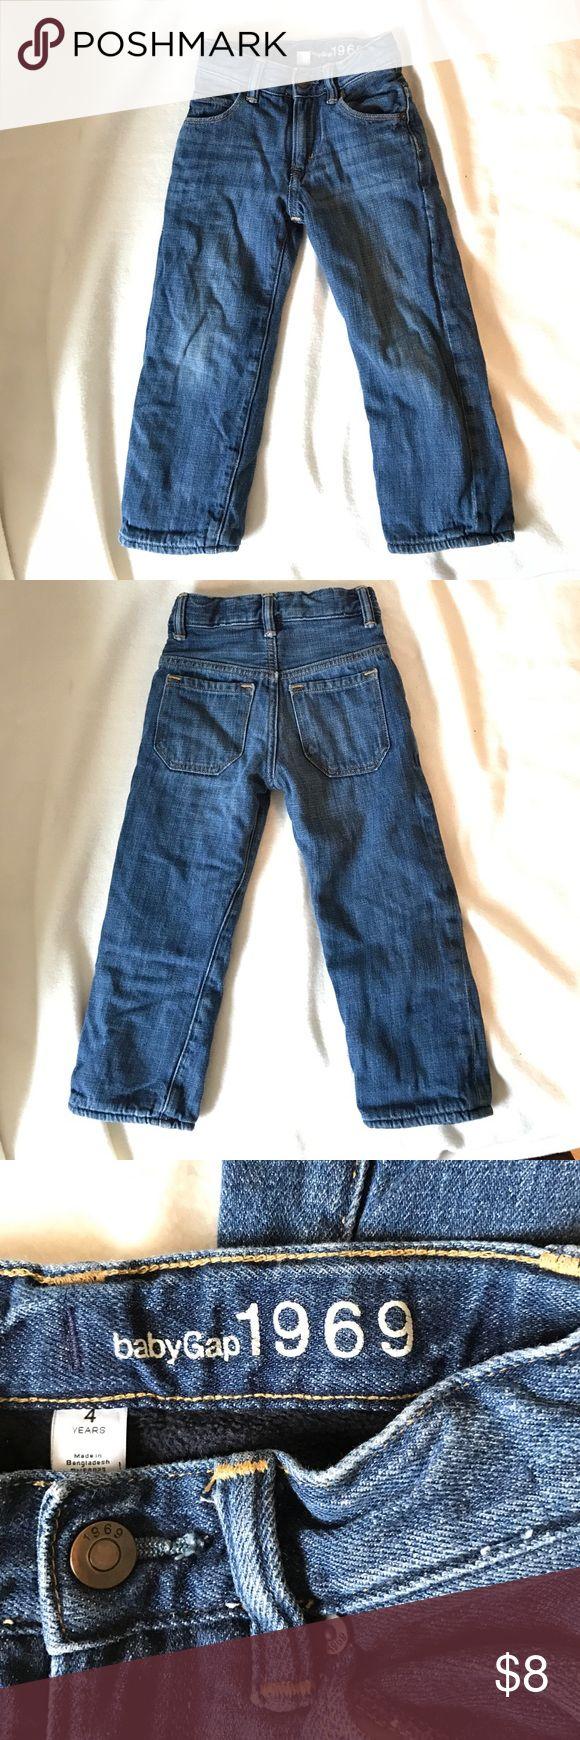 Kids Fleece Lined Jeans Size 4 Gap/Baby Gap Kids Fleece lined jeans size 4.  Gently worn.  Smoke Free Home.  Inside fleece lining is navy color.  Adjustable waist band. GAP Bottoms Jeans